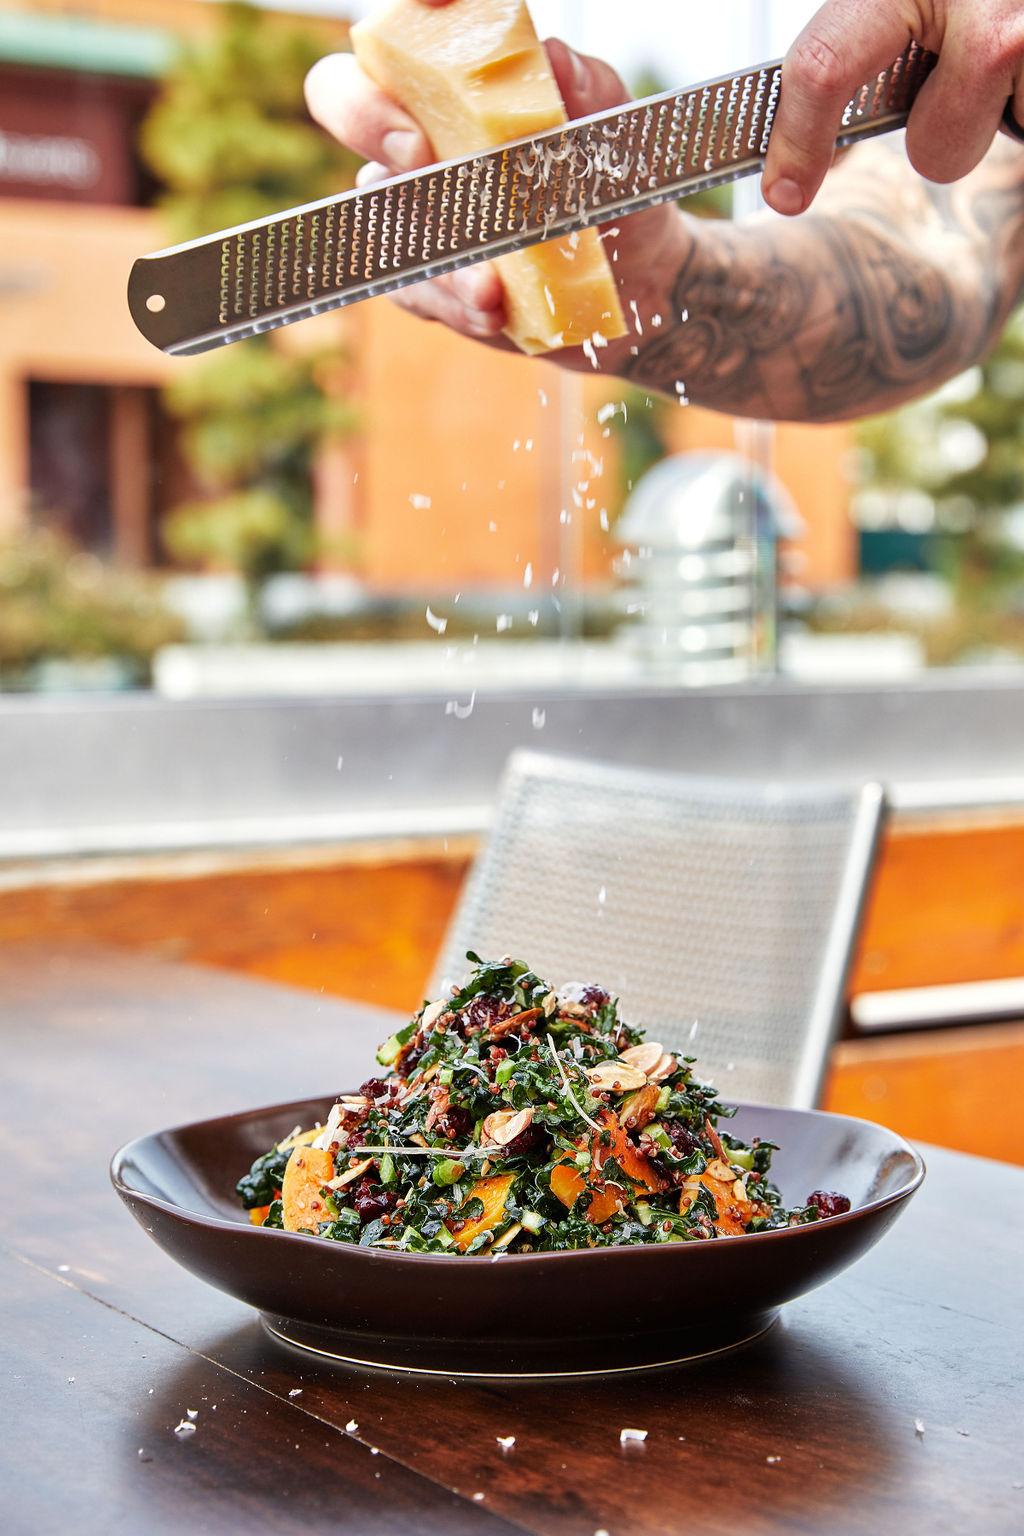 Server grating fresh Parmesan on our Kale Quinoa salad